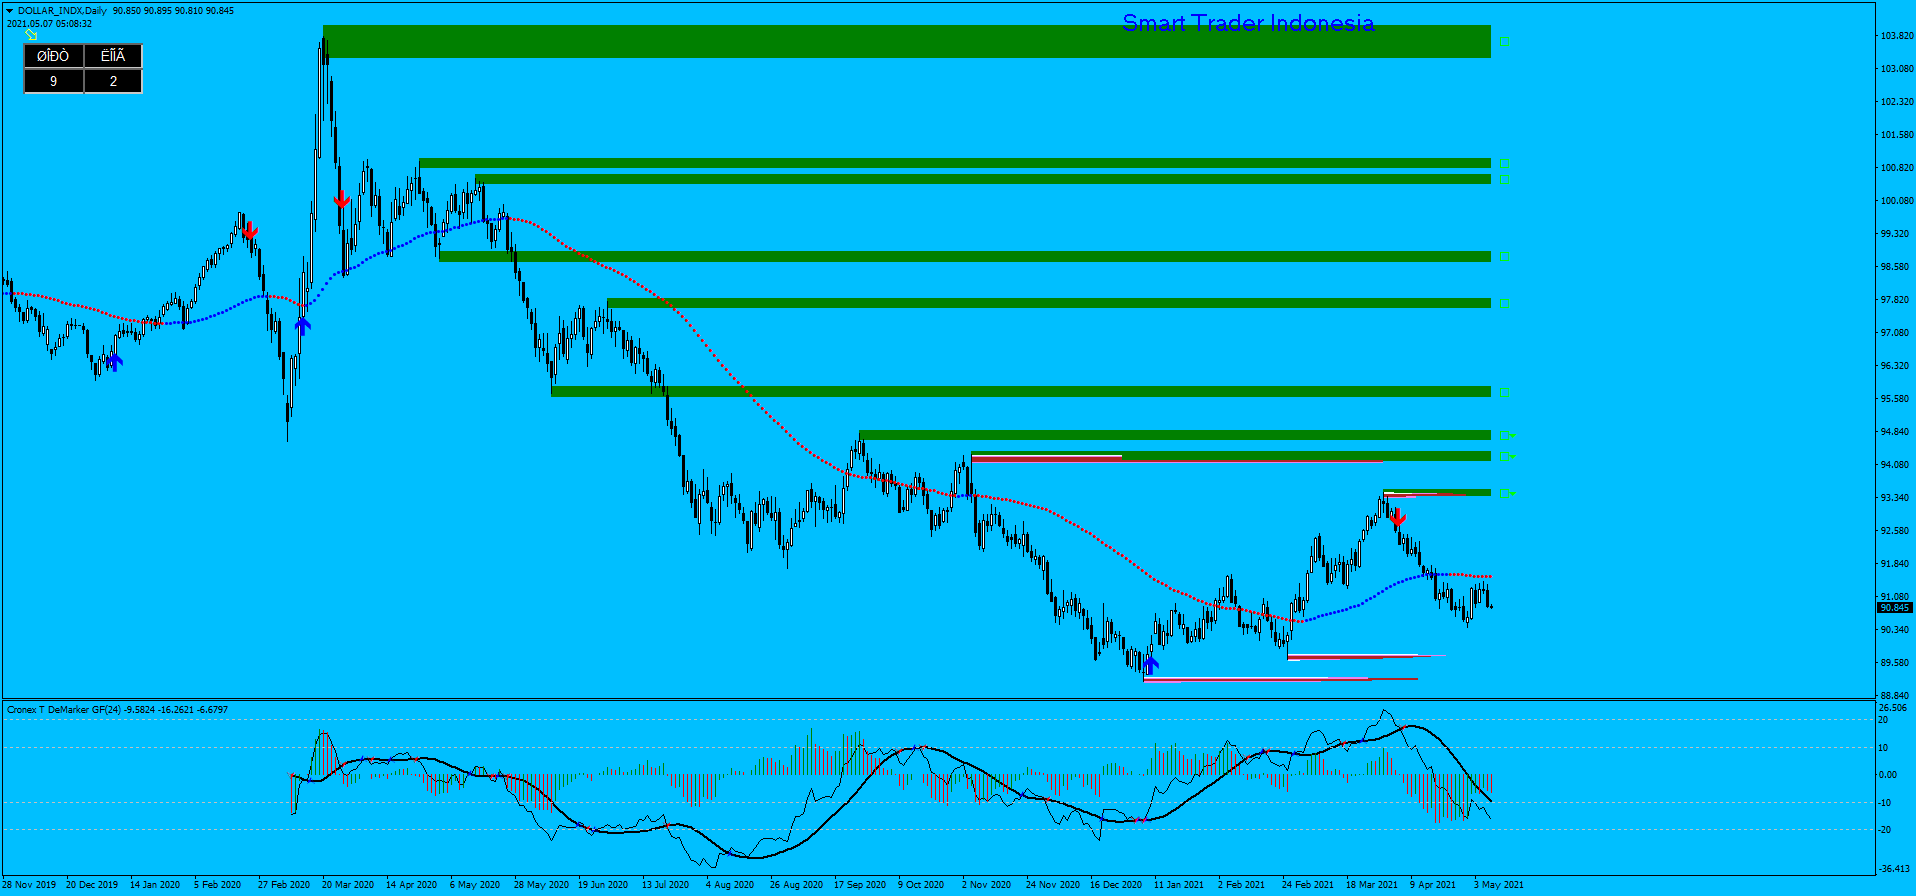 dollar-indx-d1-ava-trade-ltd.png